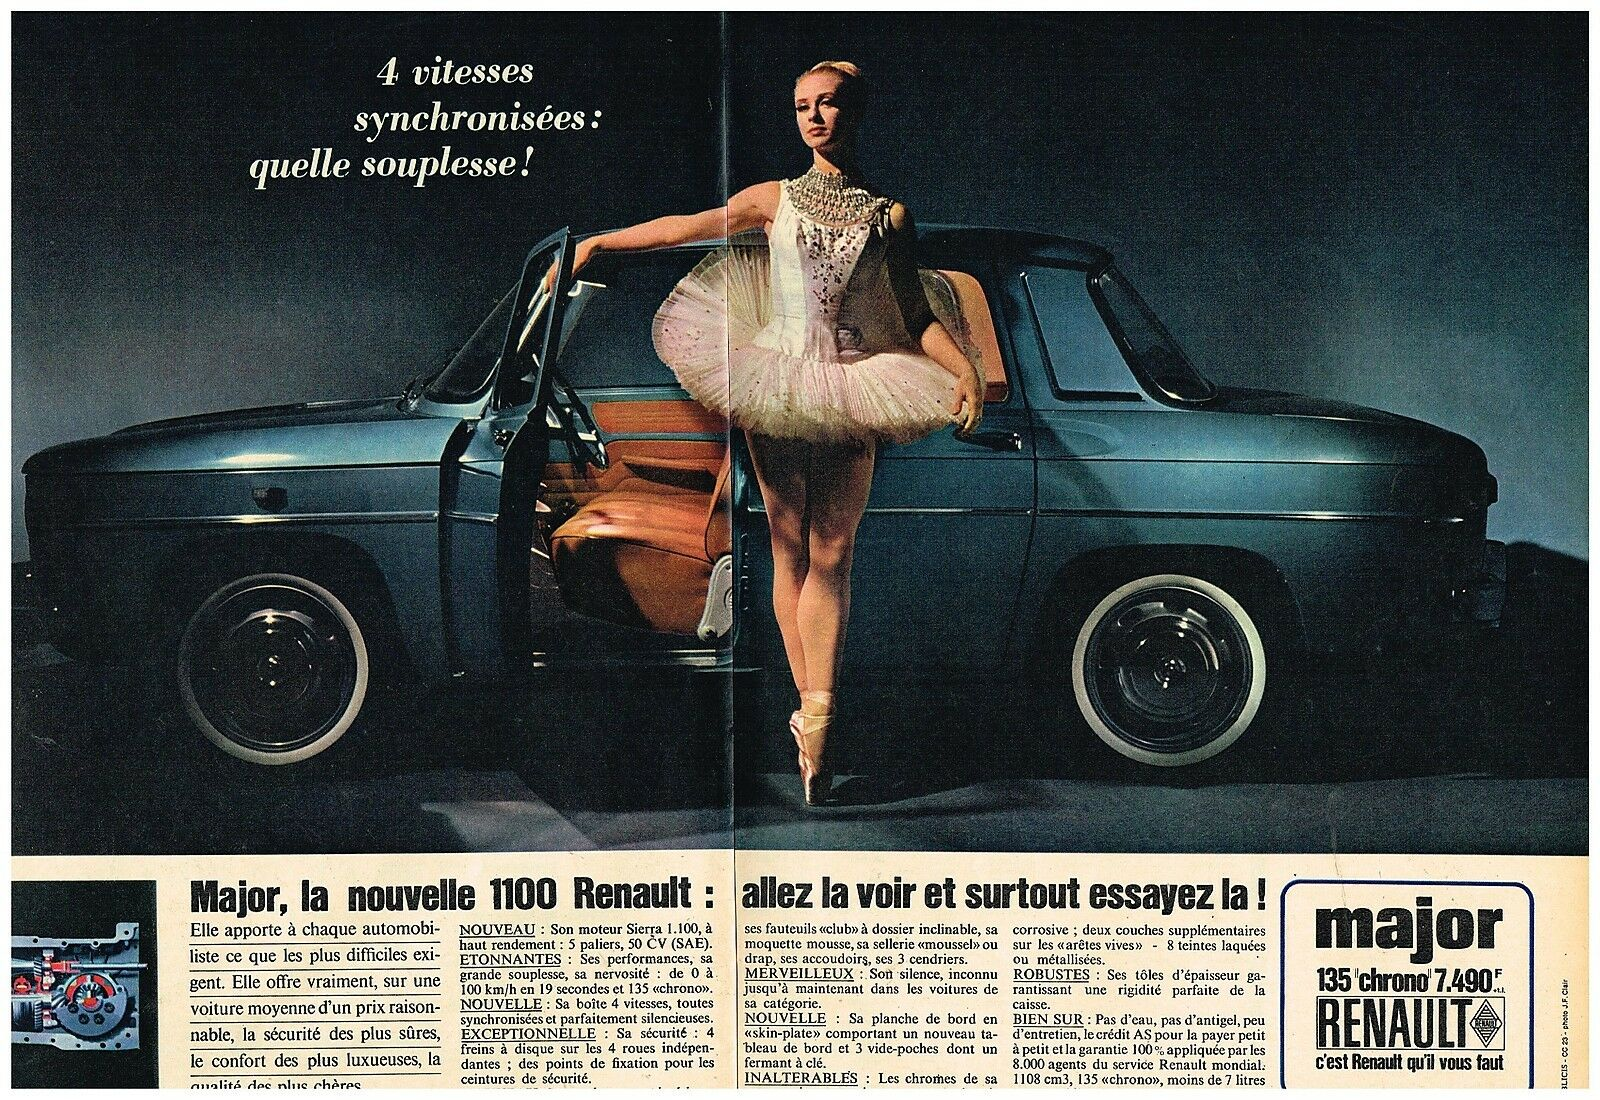 1964 Renault 1100 Major